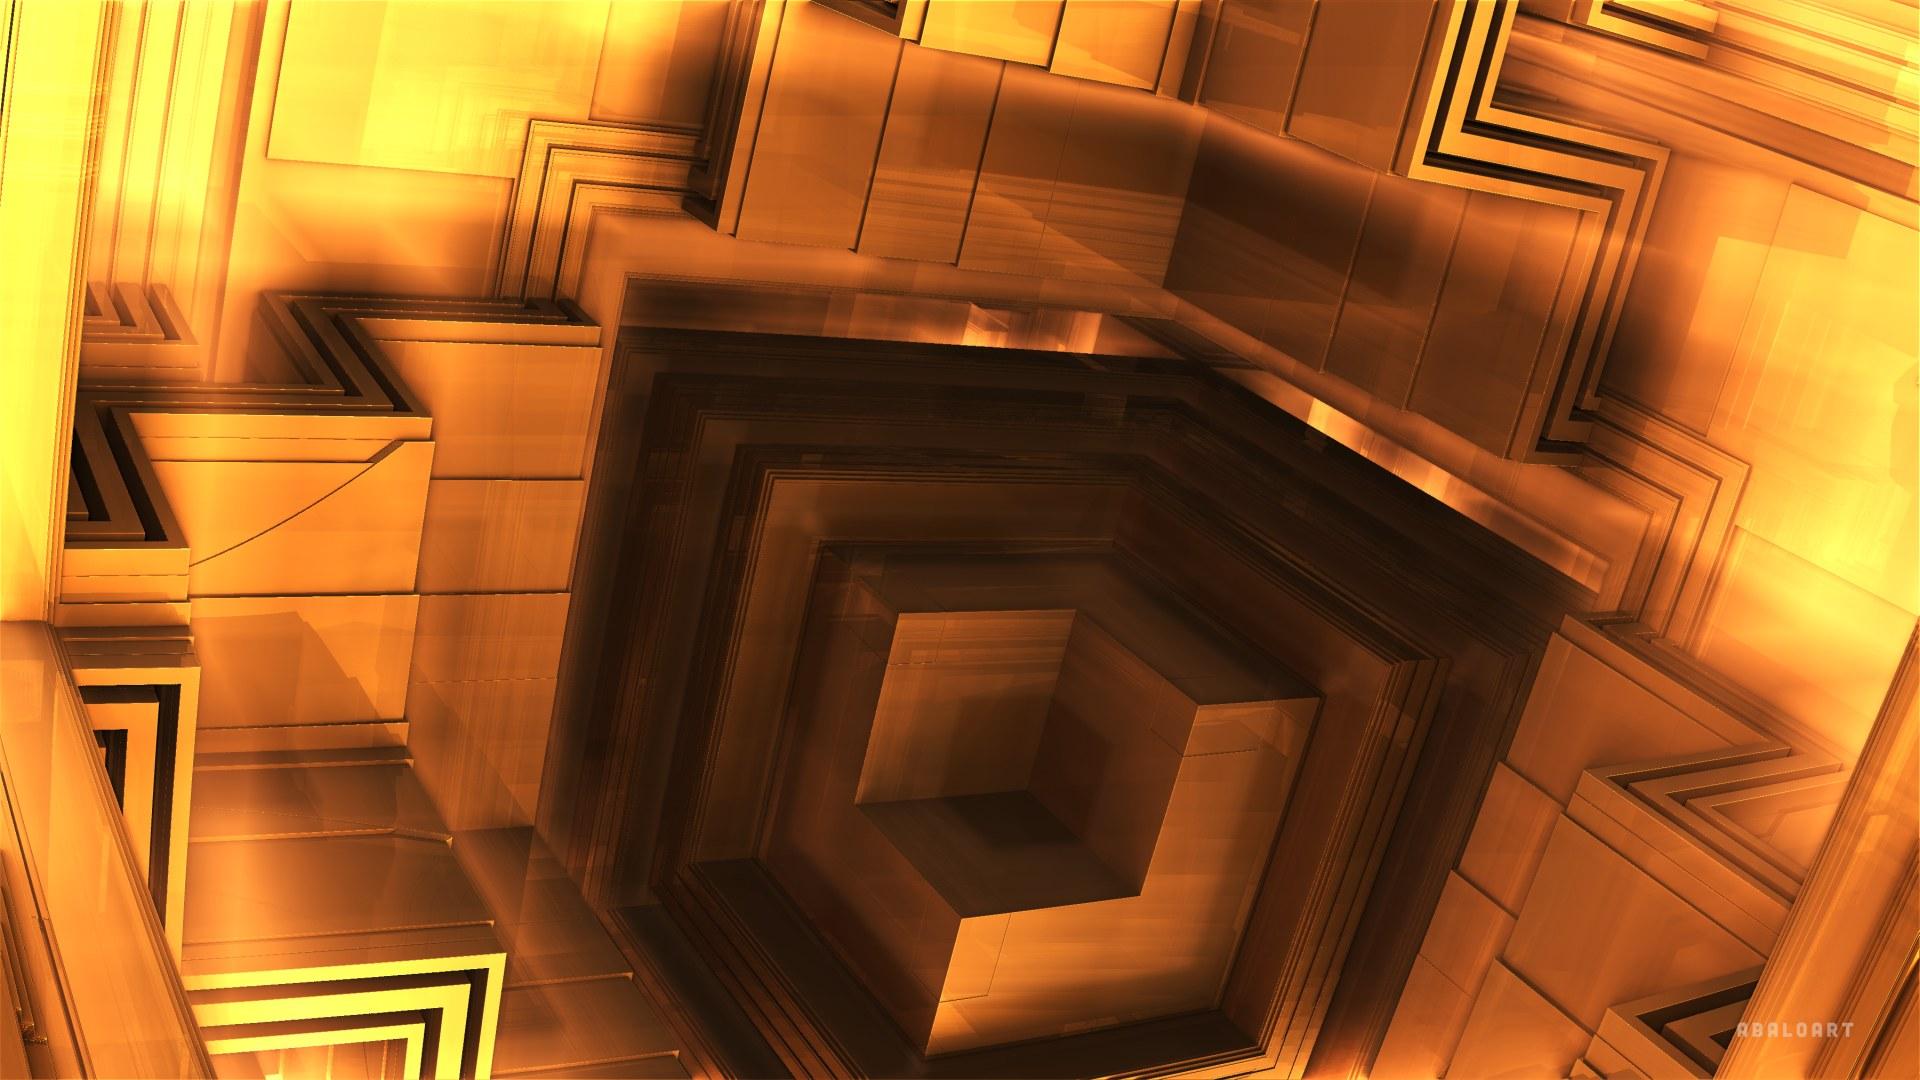 Golden Box by batjorge